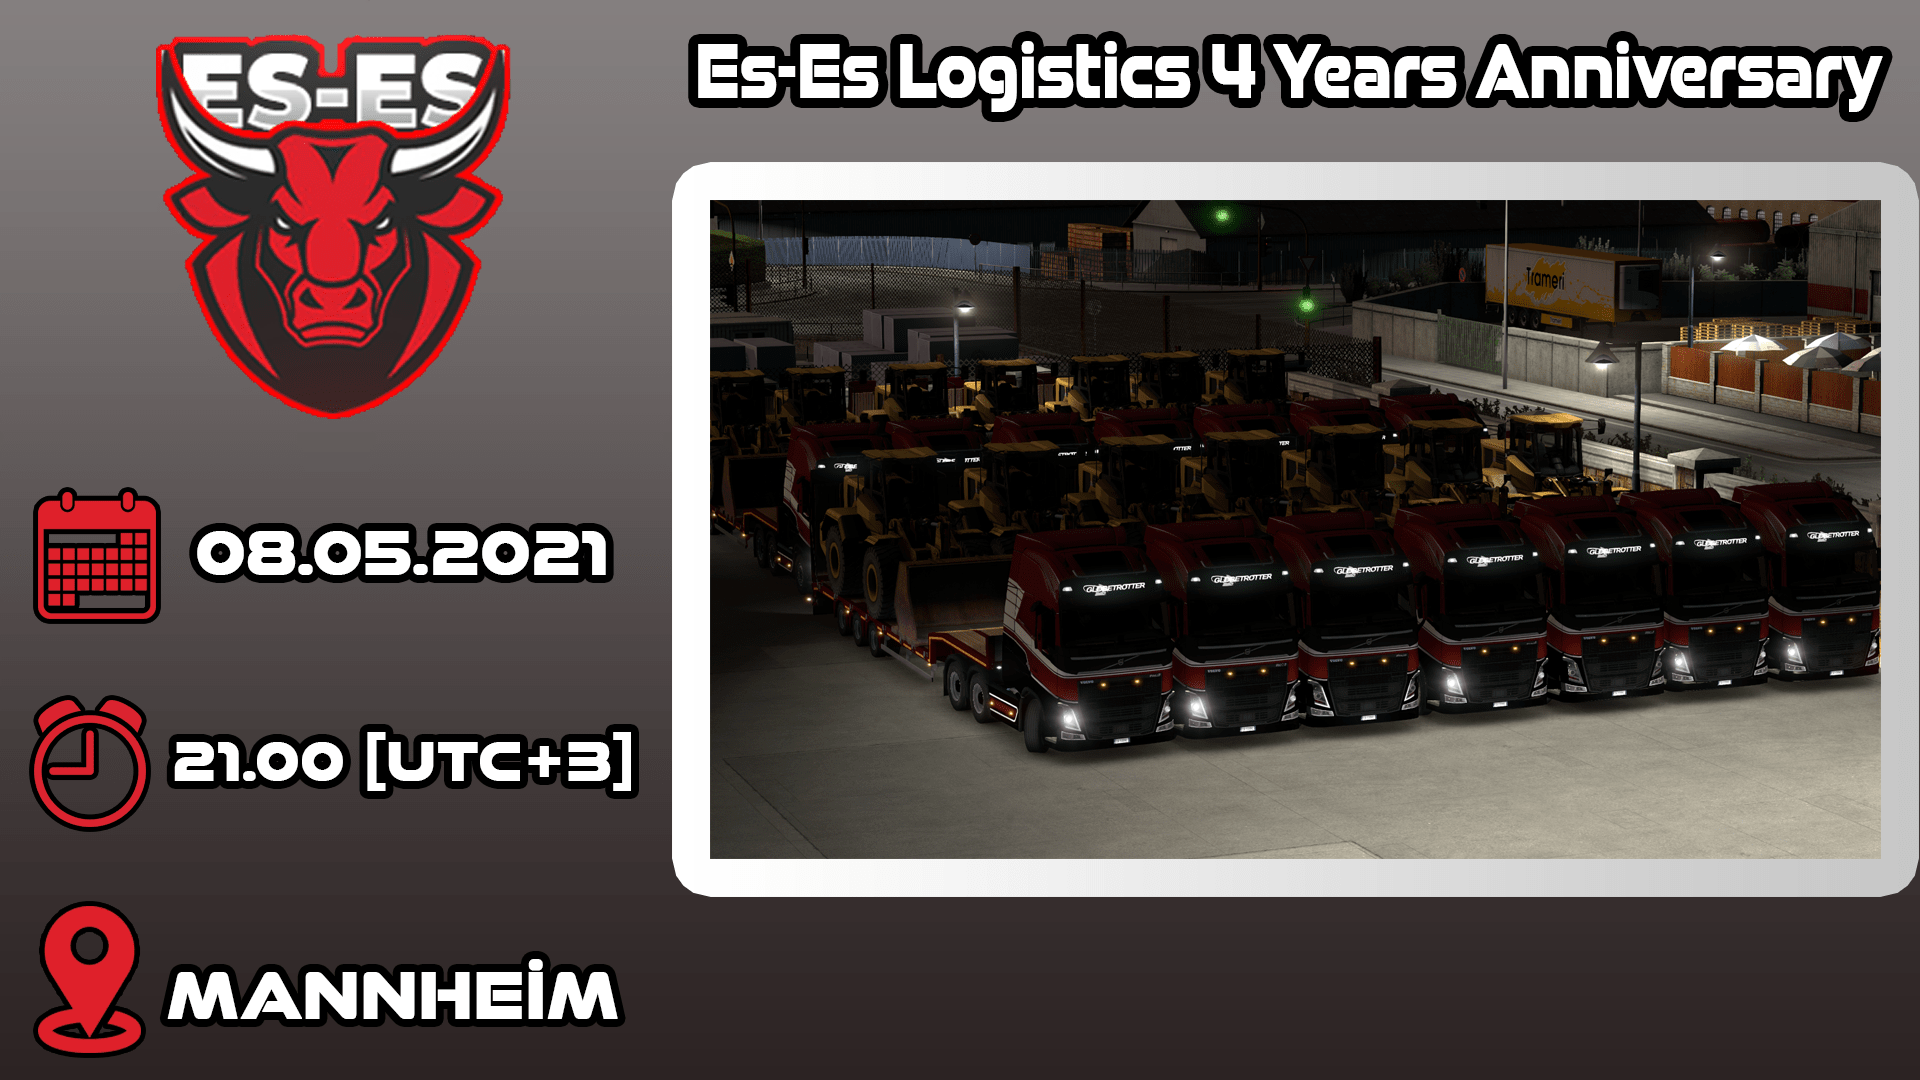 Es-Es Logistics 4 Years Anniversary Convoy